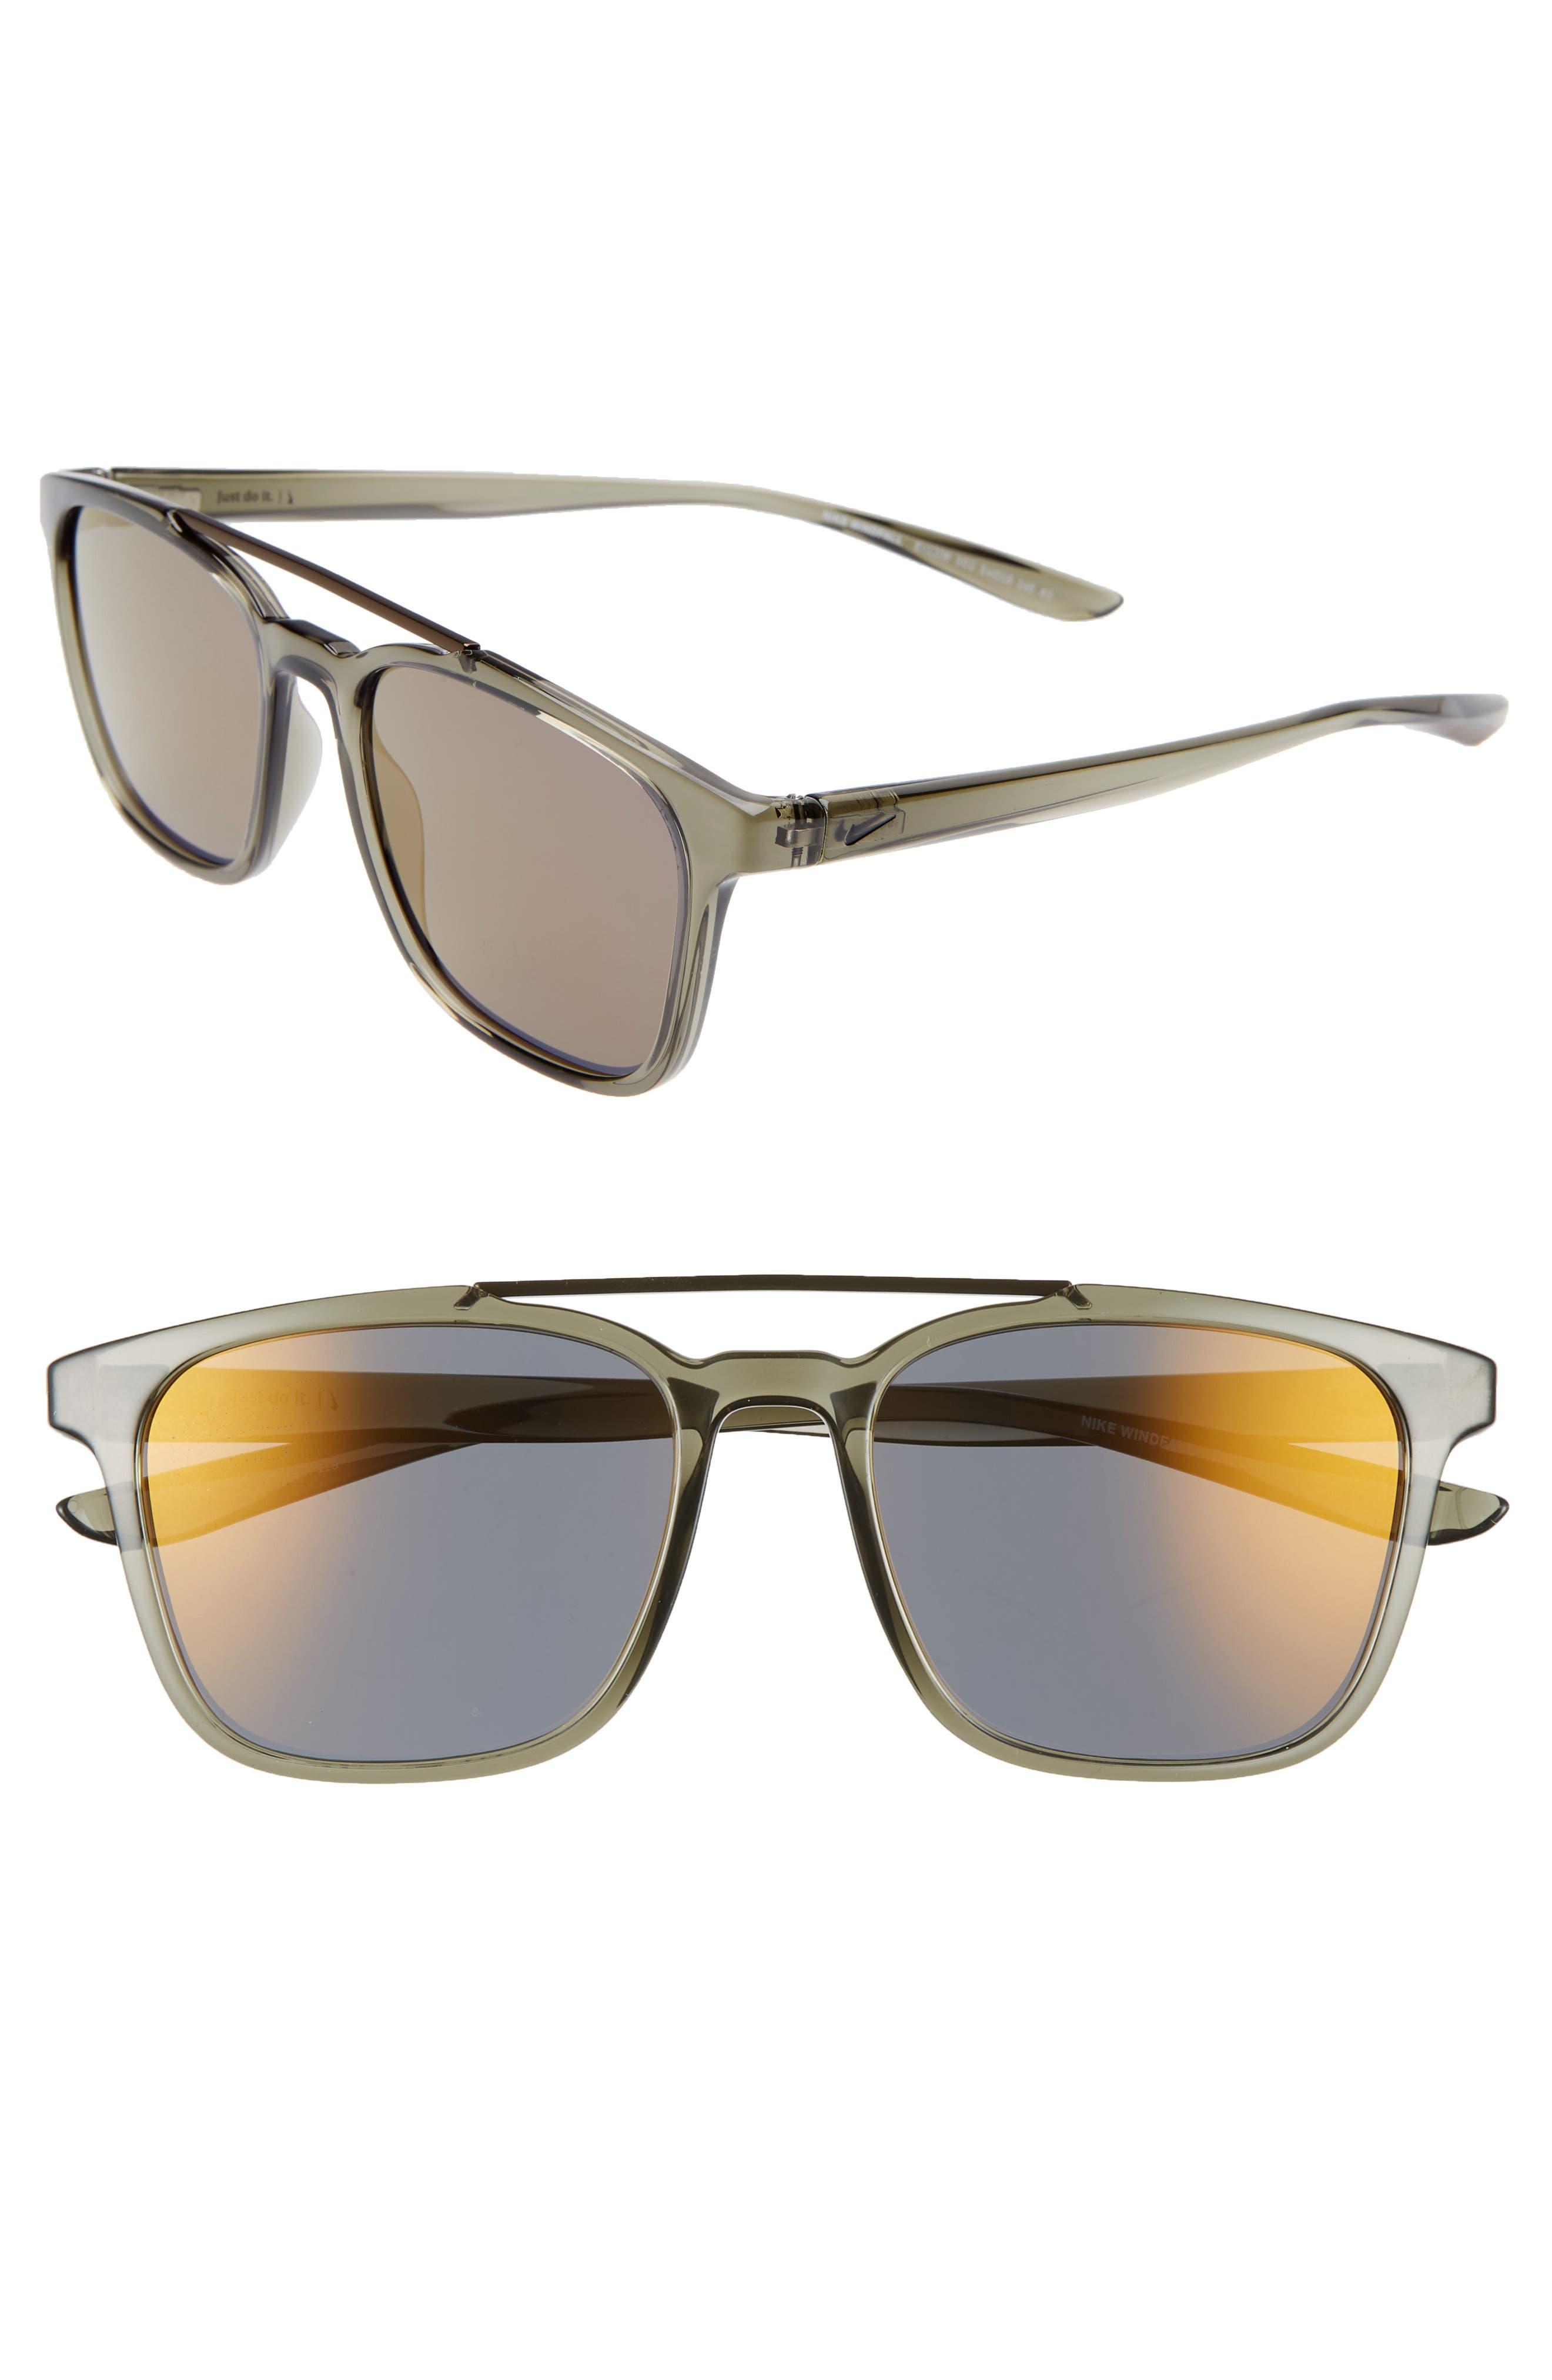 Nike Windfall 5m Square Sunglasses - Grey/ Grey